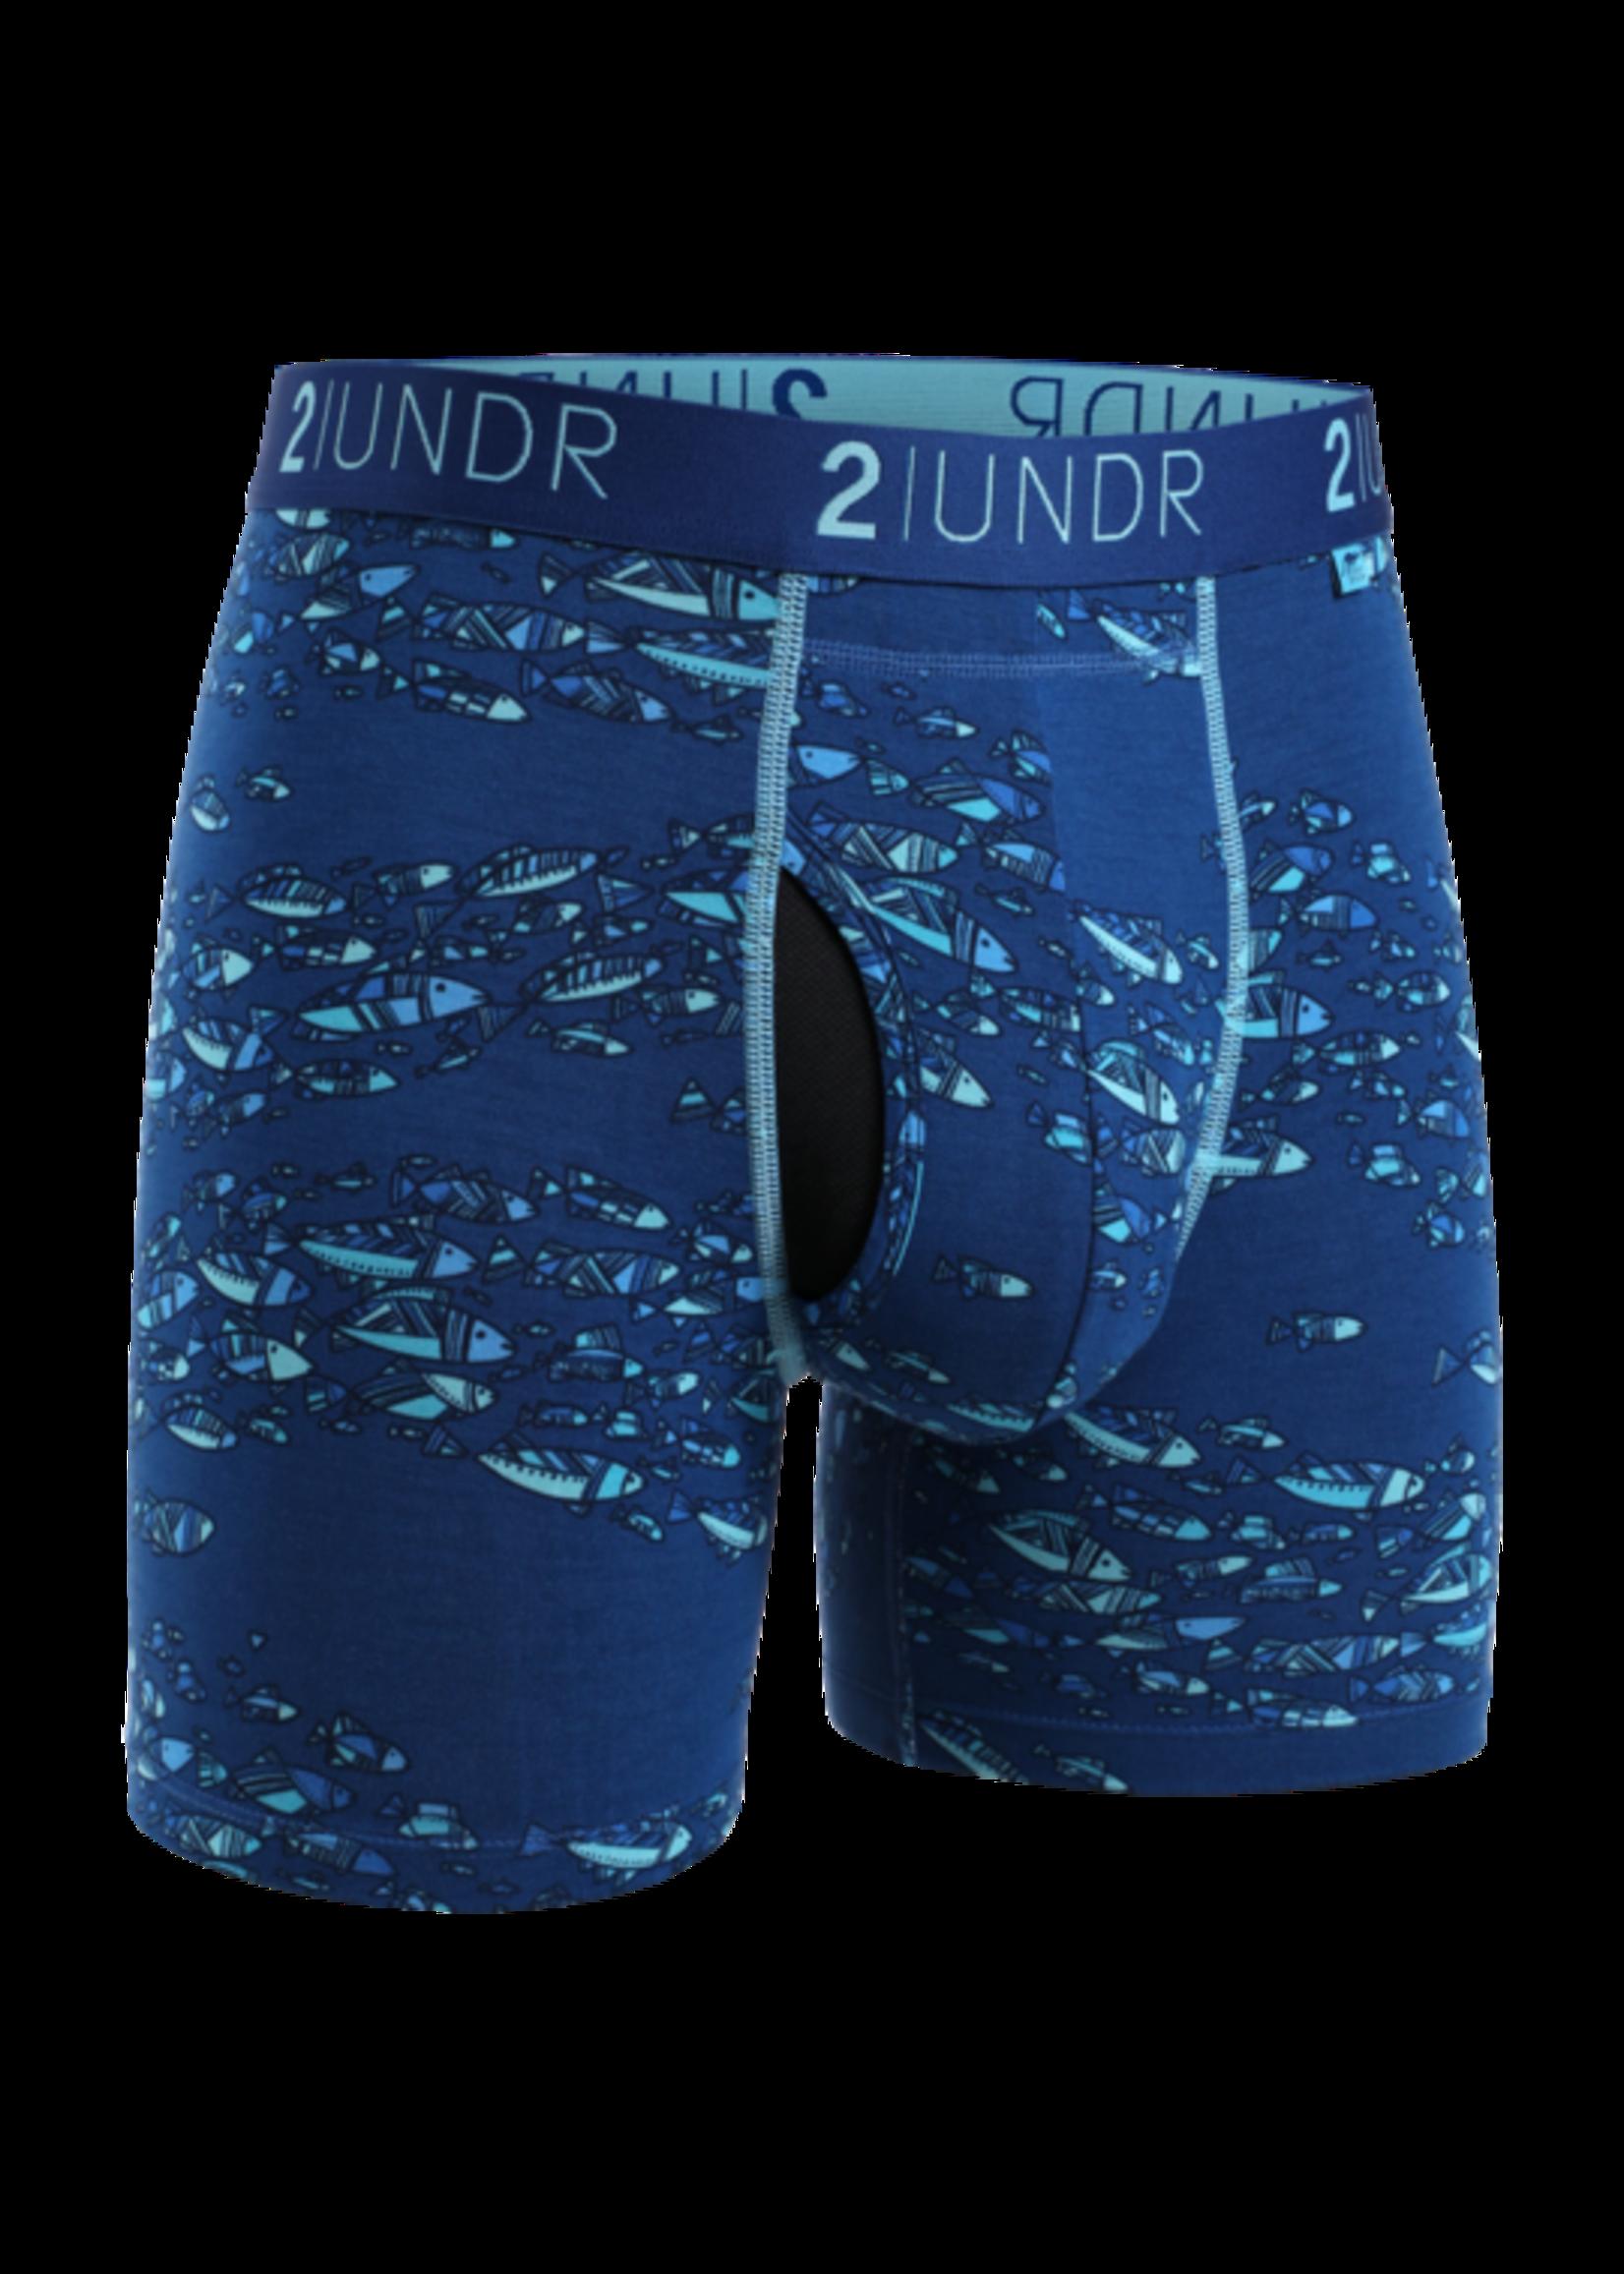 "2UNDR 2UNDR's 2 Pack ""Fish School / Flamingo"" Swing Shift Boxer Brief"